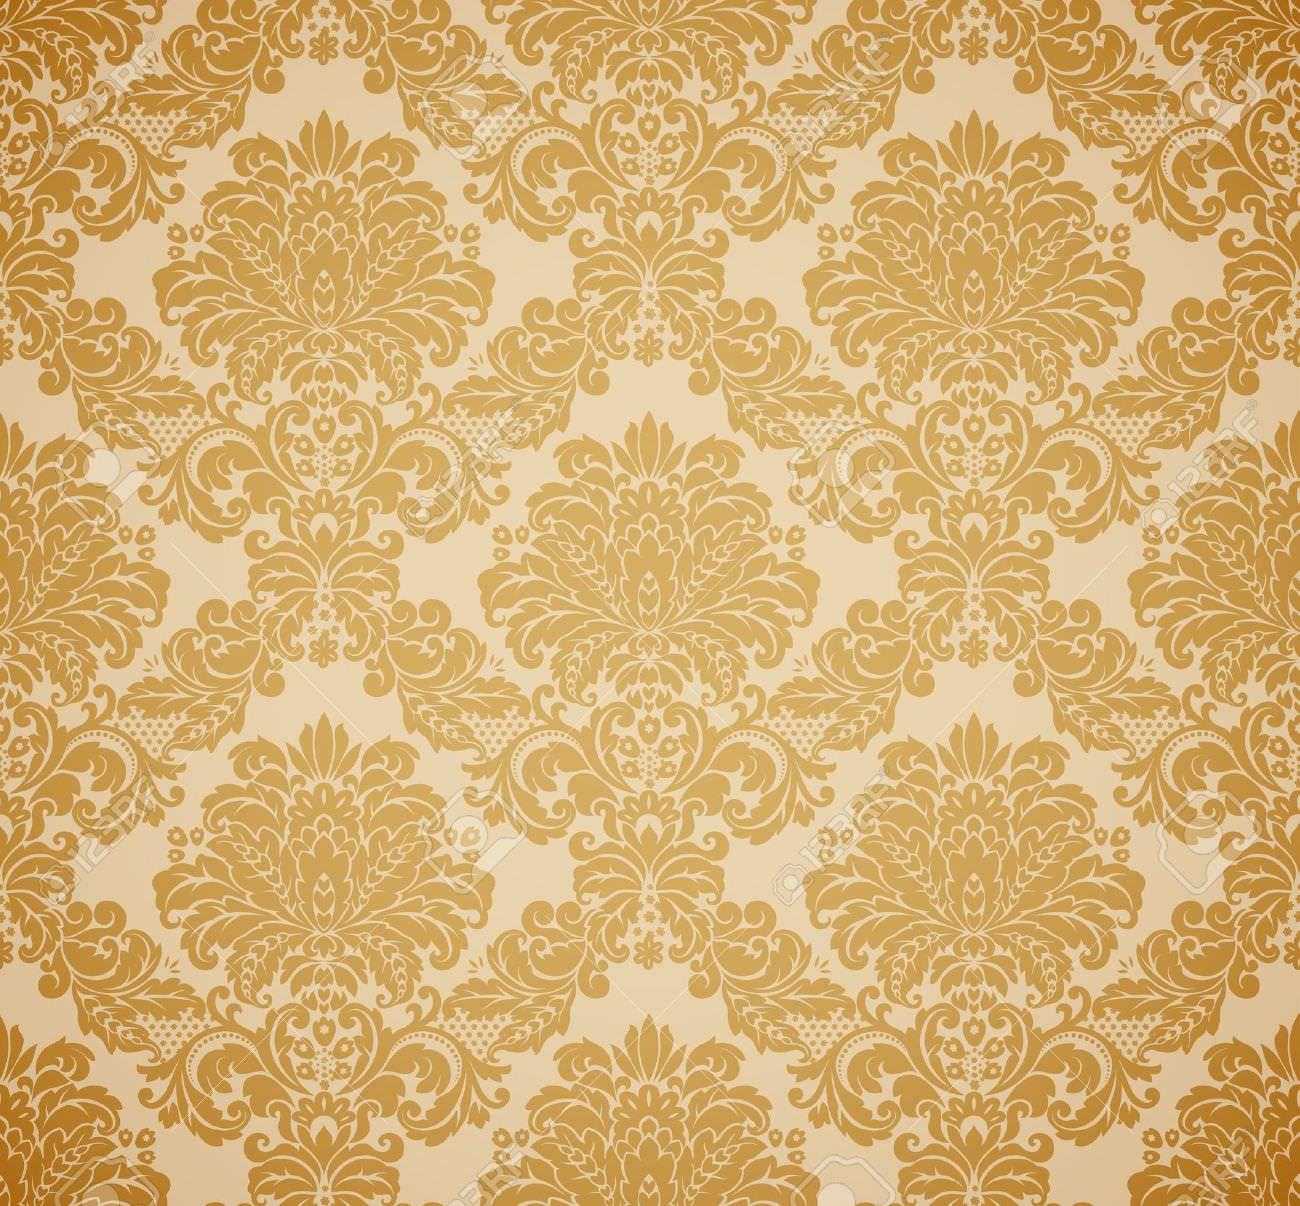 gold foil damask wallpaper